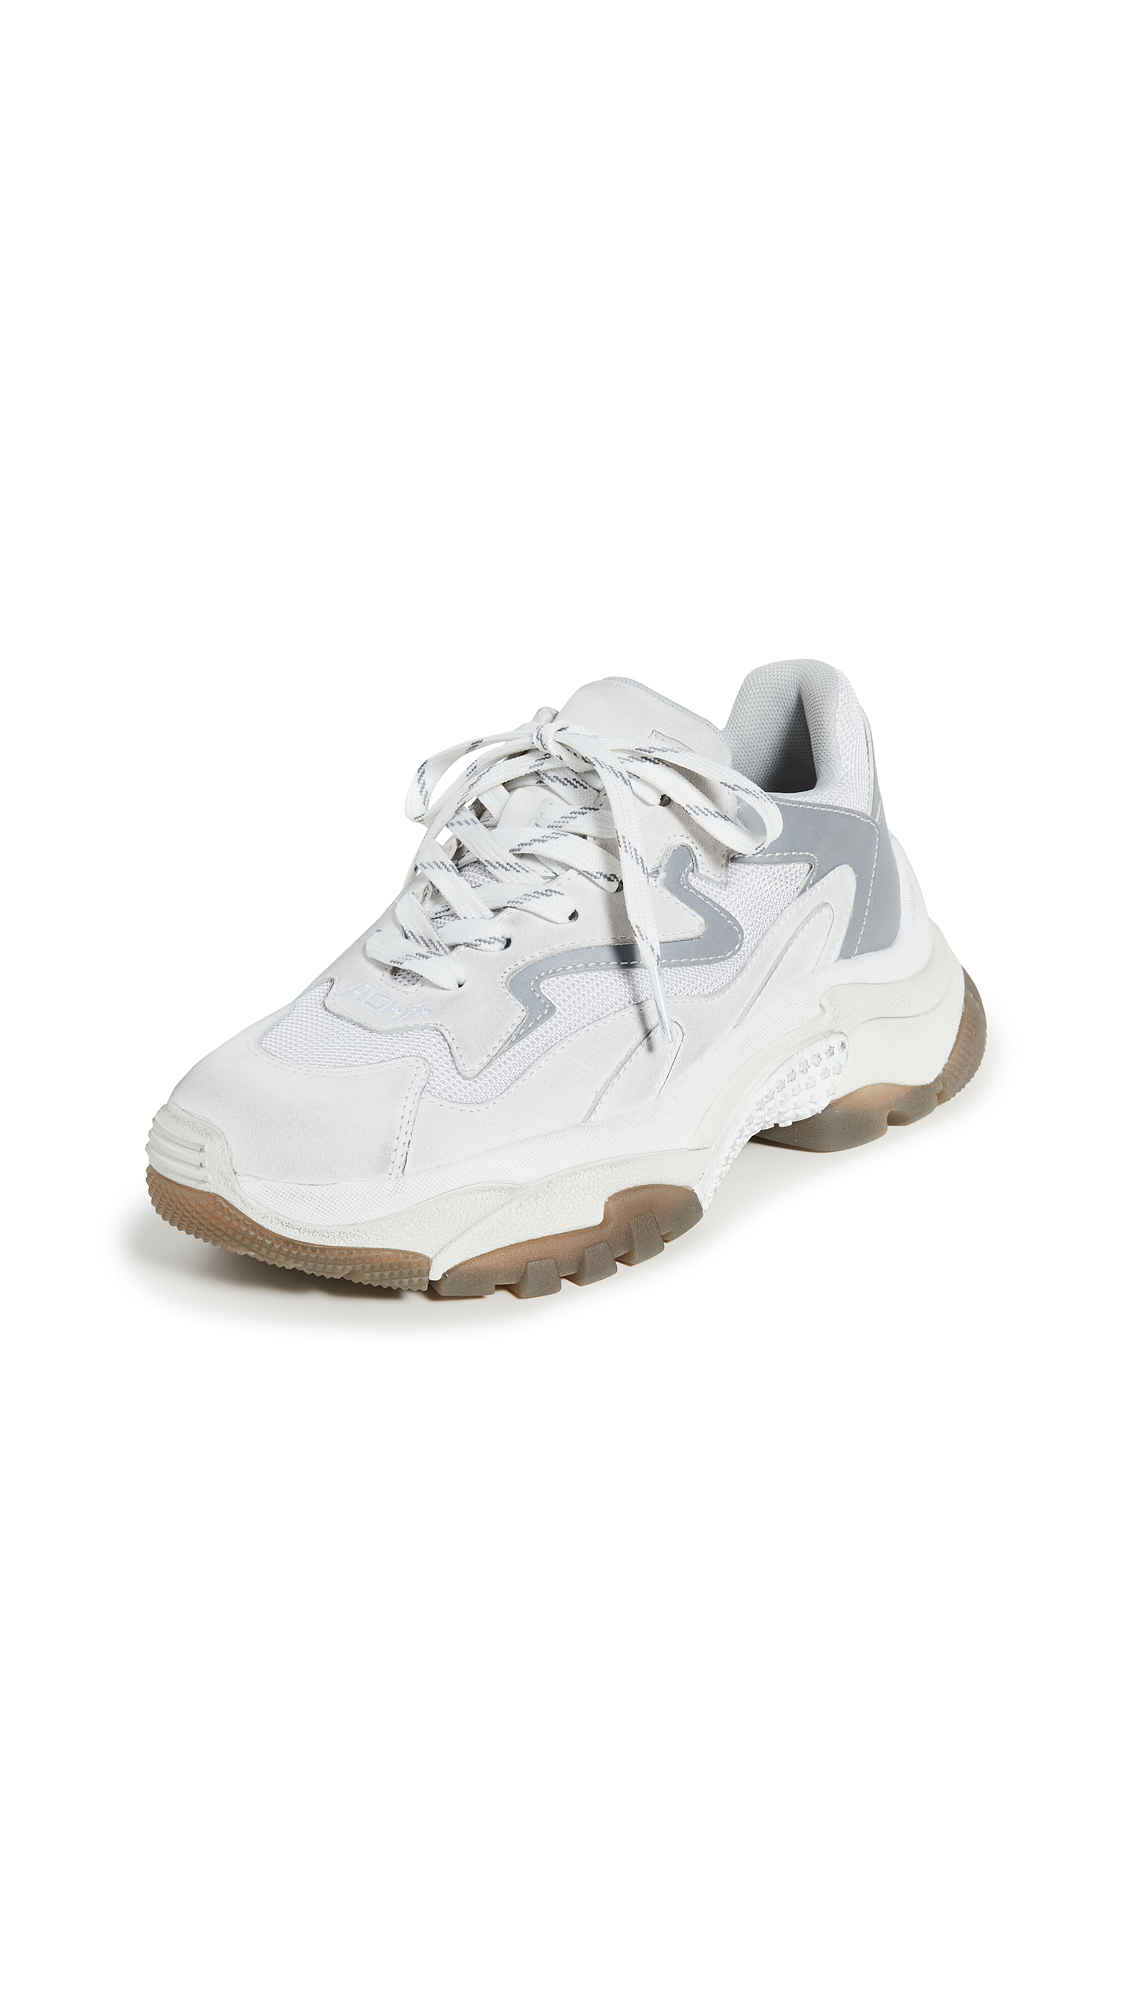 Buy Ash Addict Sneakers online, shop Ash